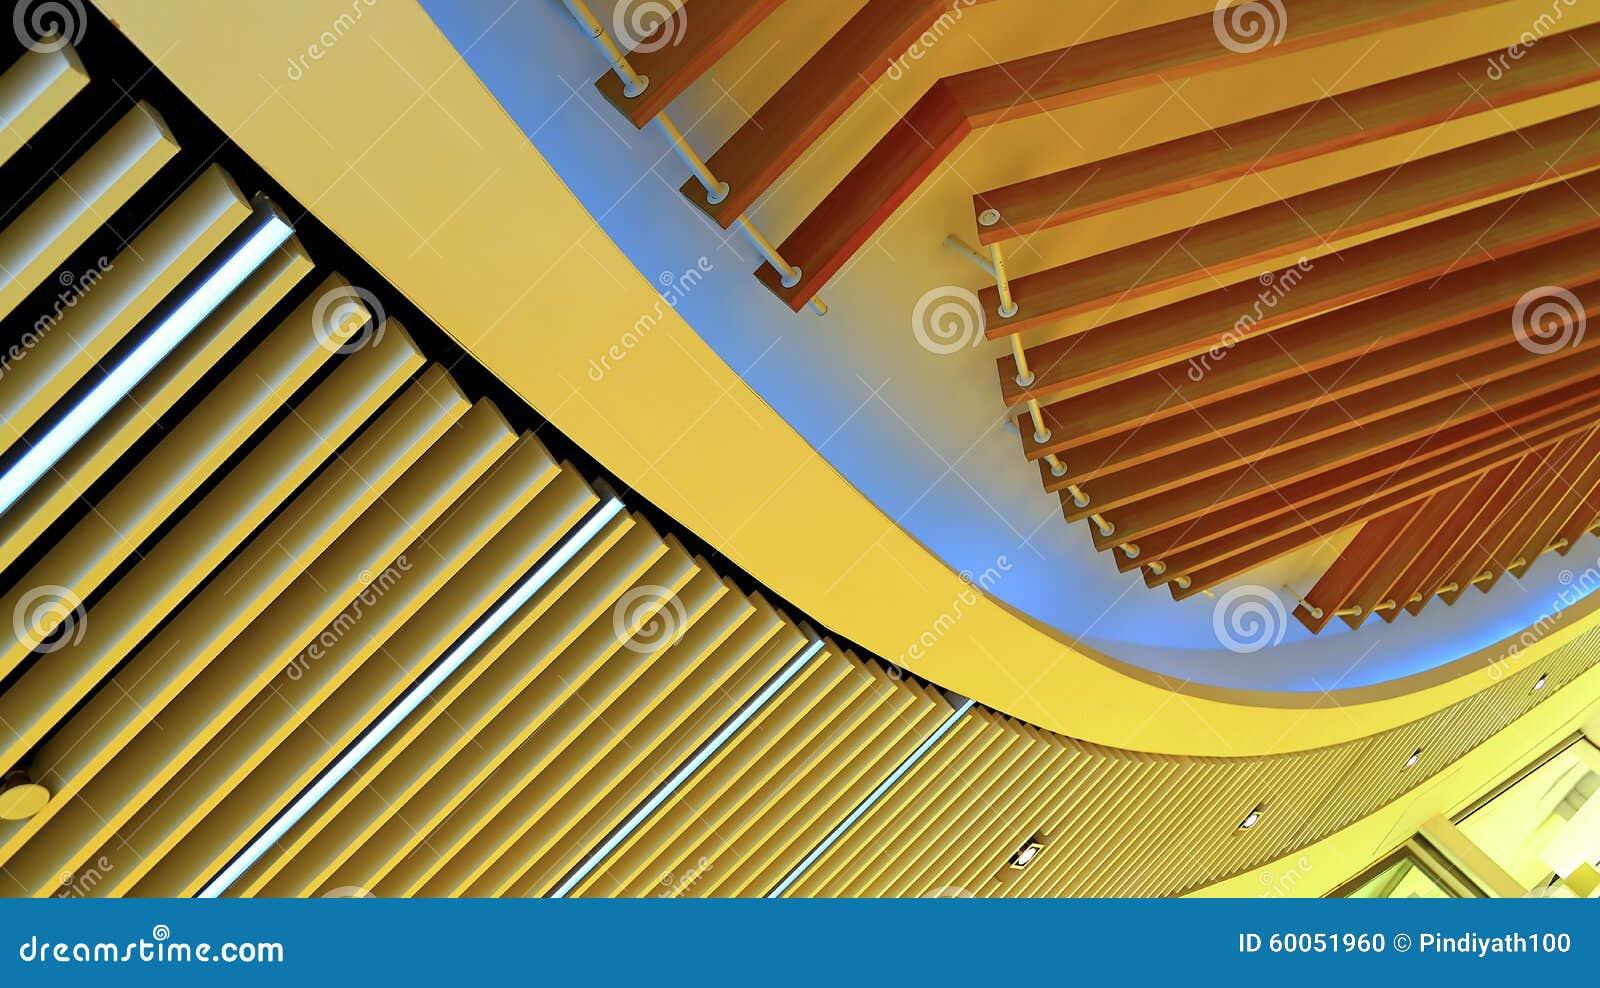 Projeto gráfico do dispositivo bonde de madeira das luzes de teto